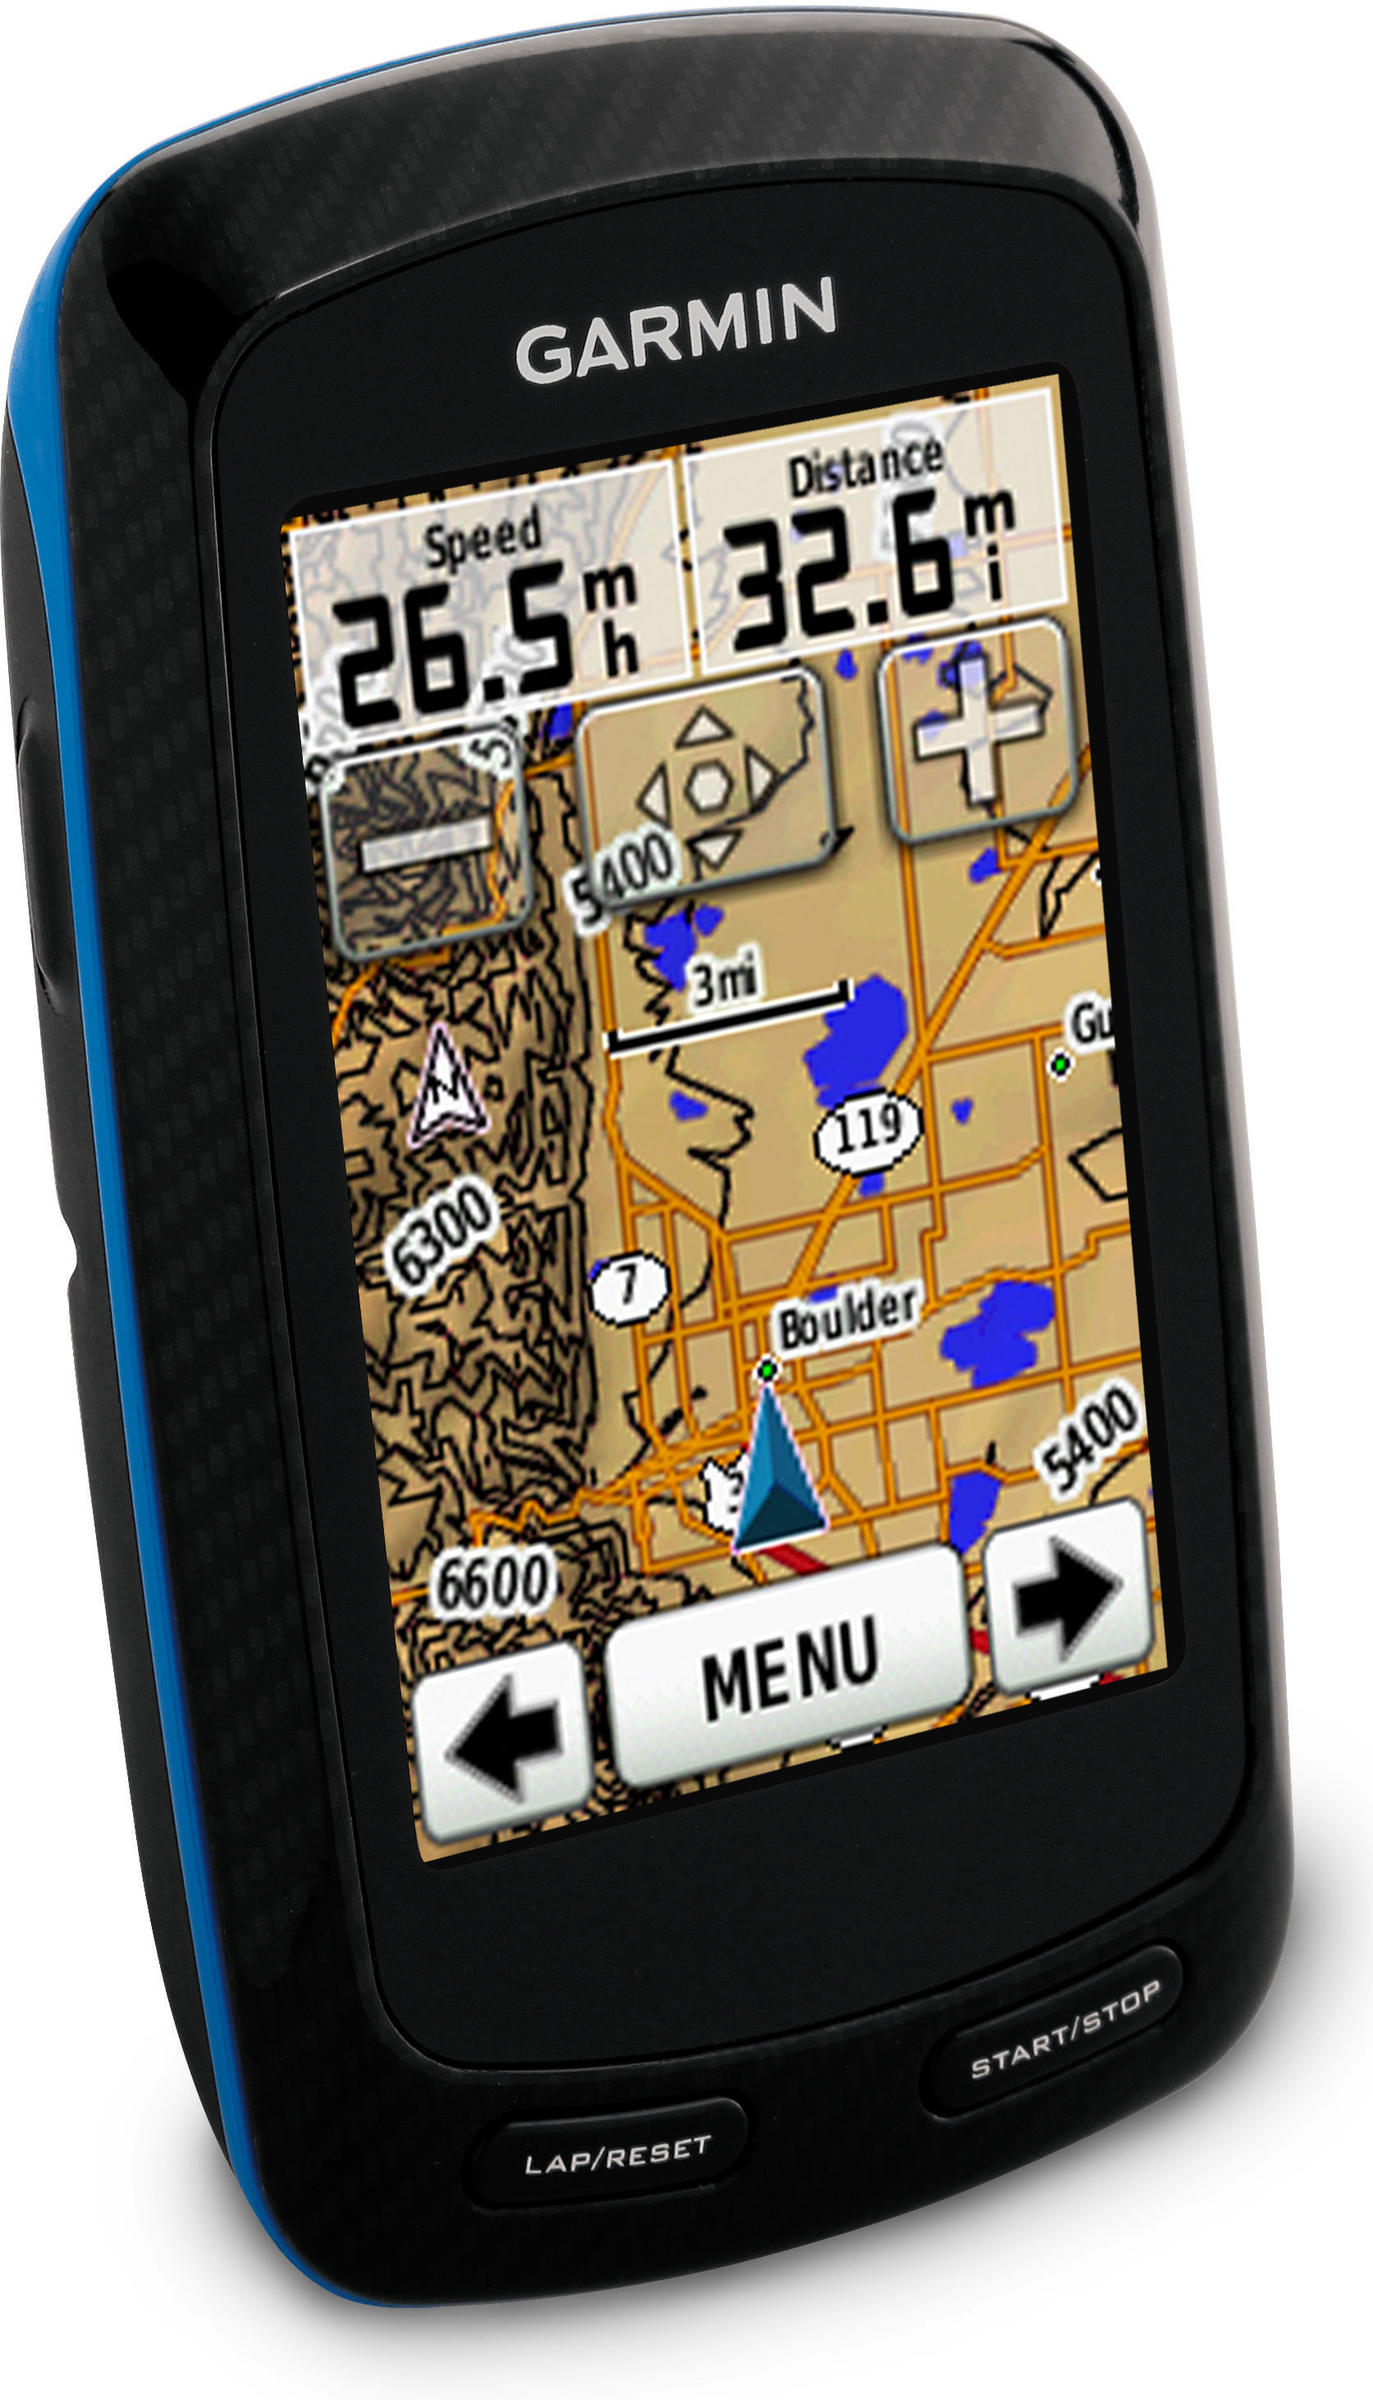 Garmin Edge 800 w/Heart Rate Monitor, Cadence And Street